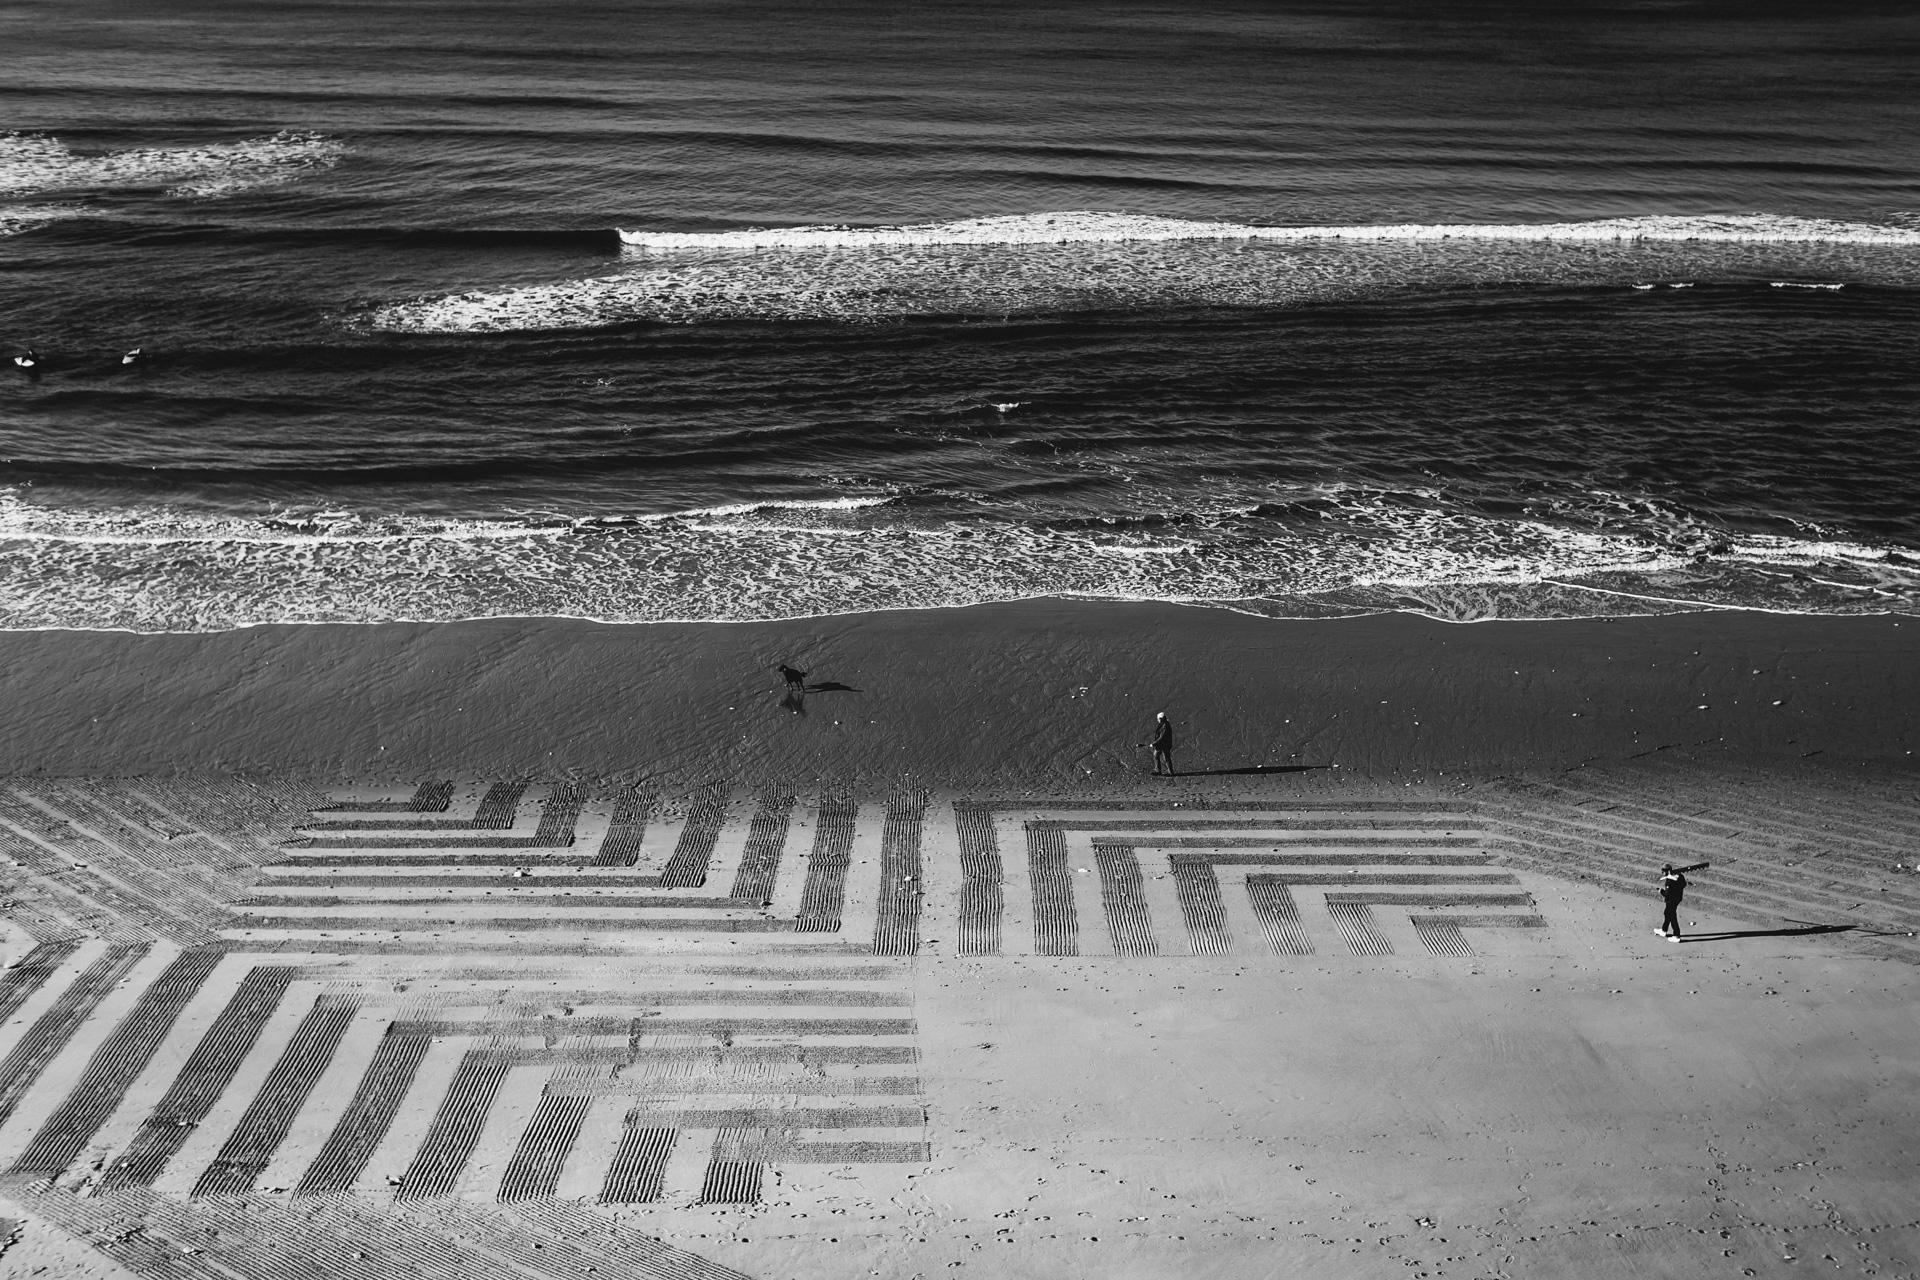 Damien-dohmen-sand-print-lx-one-21